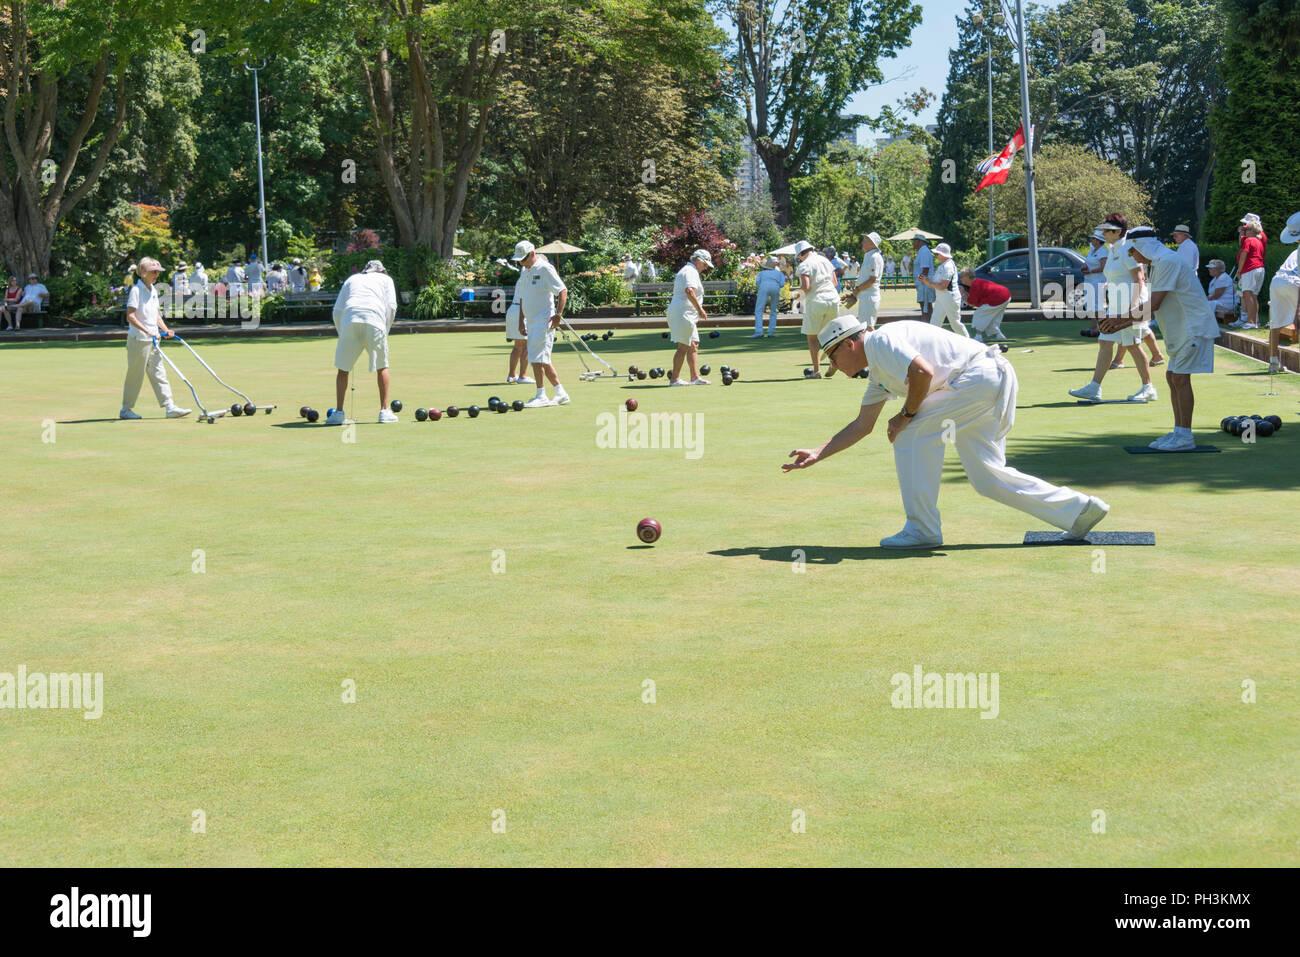 Lawn Bowling - Stock Image